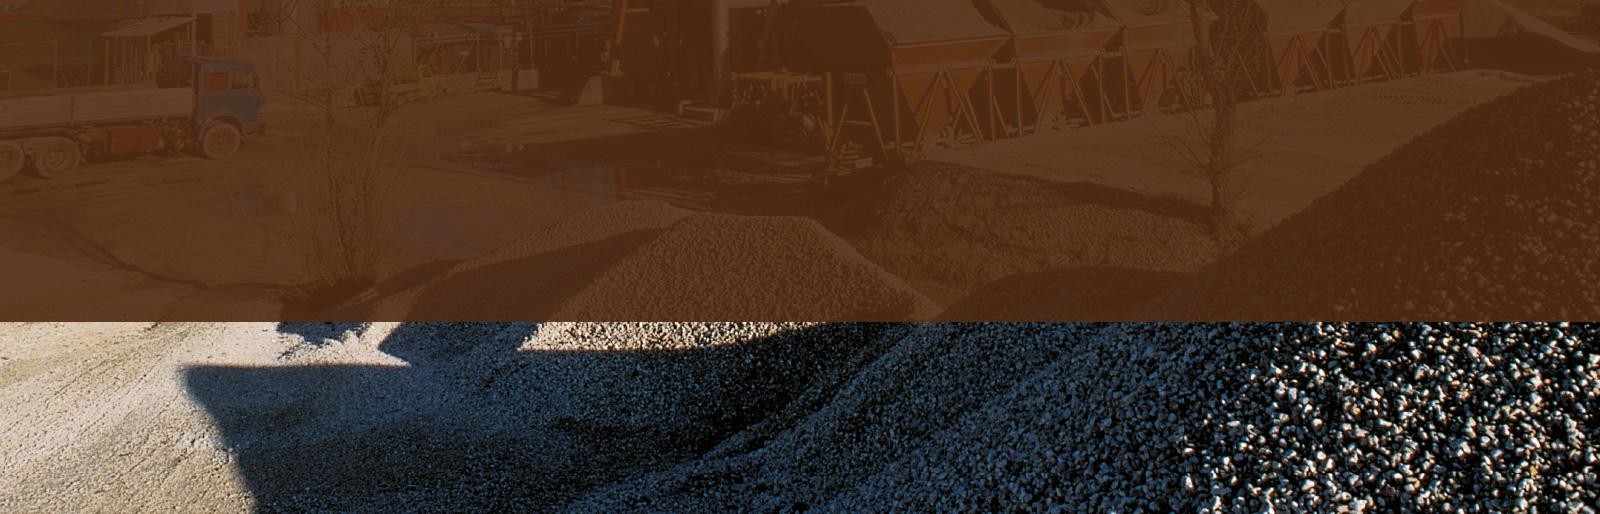 materiali-pronti-adriatica-asfalti